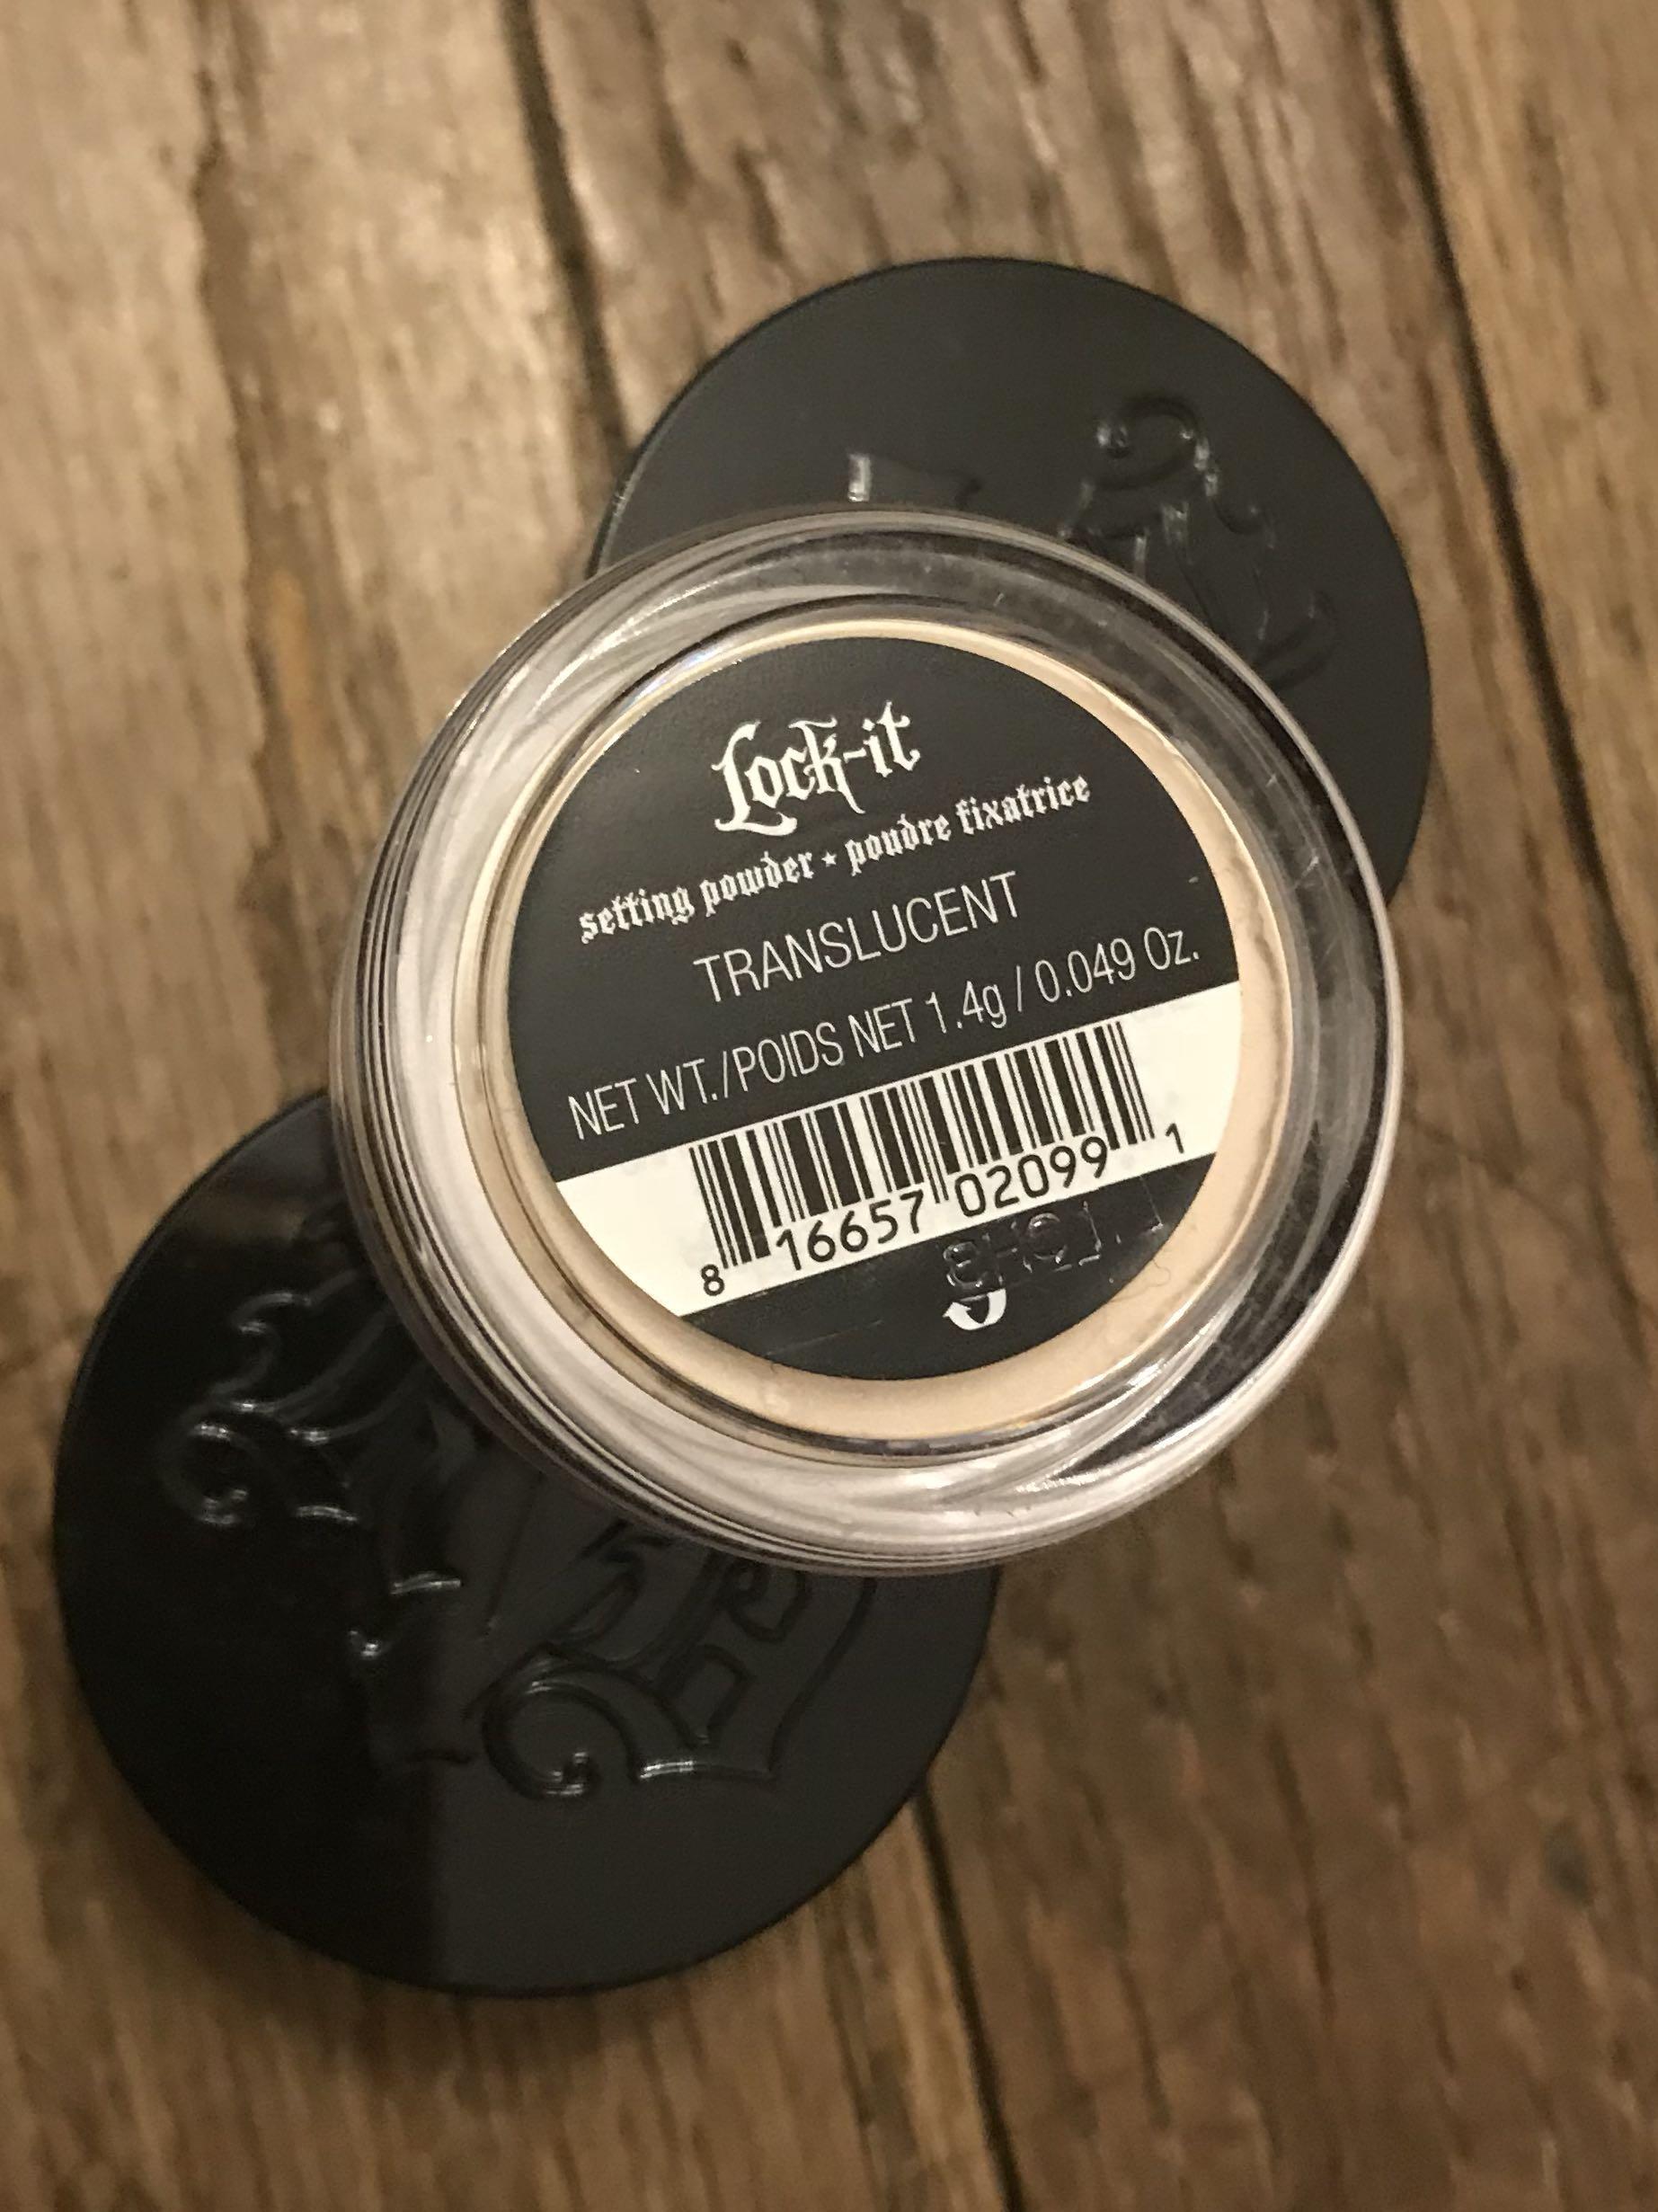 Brand new Kat von d translucent setting powder lock it $10 for all 3